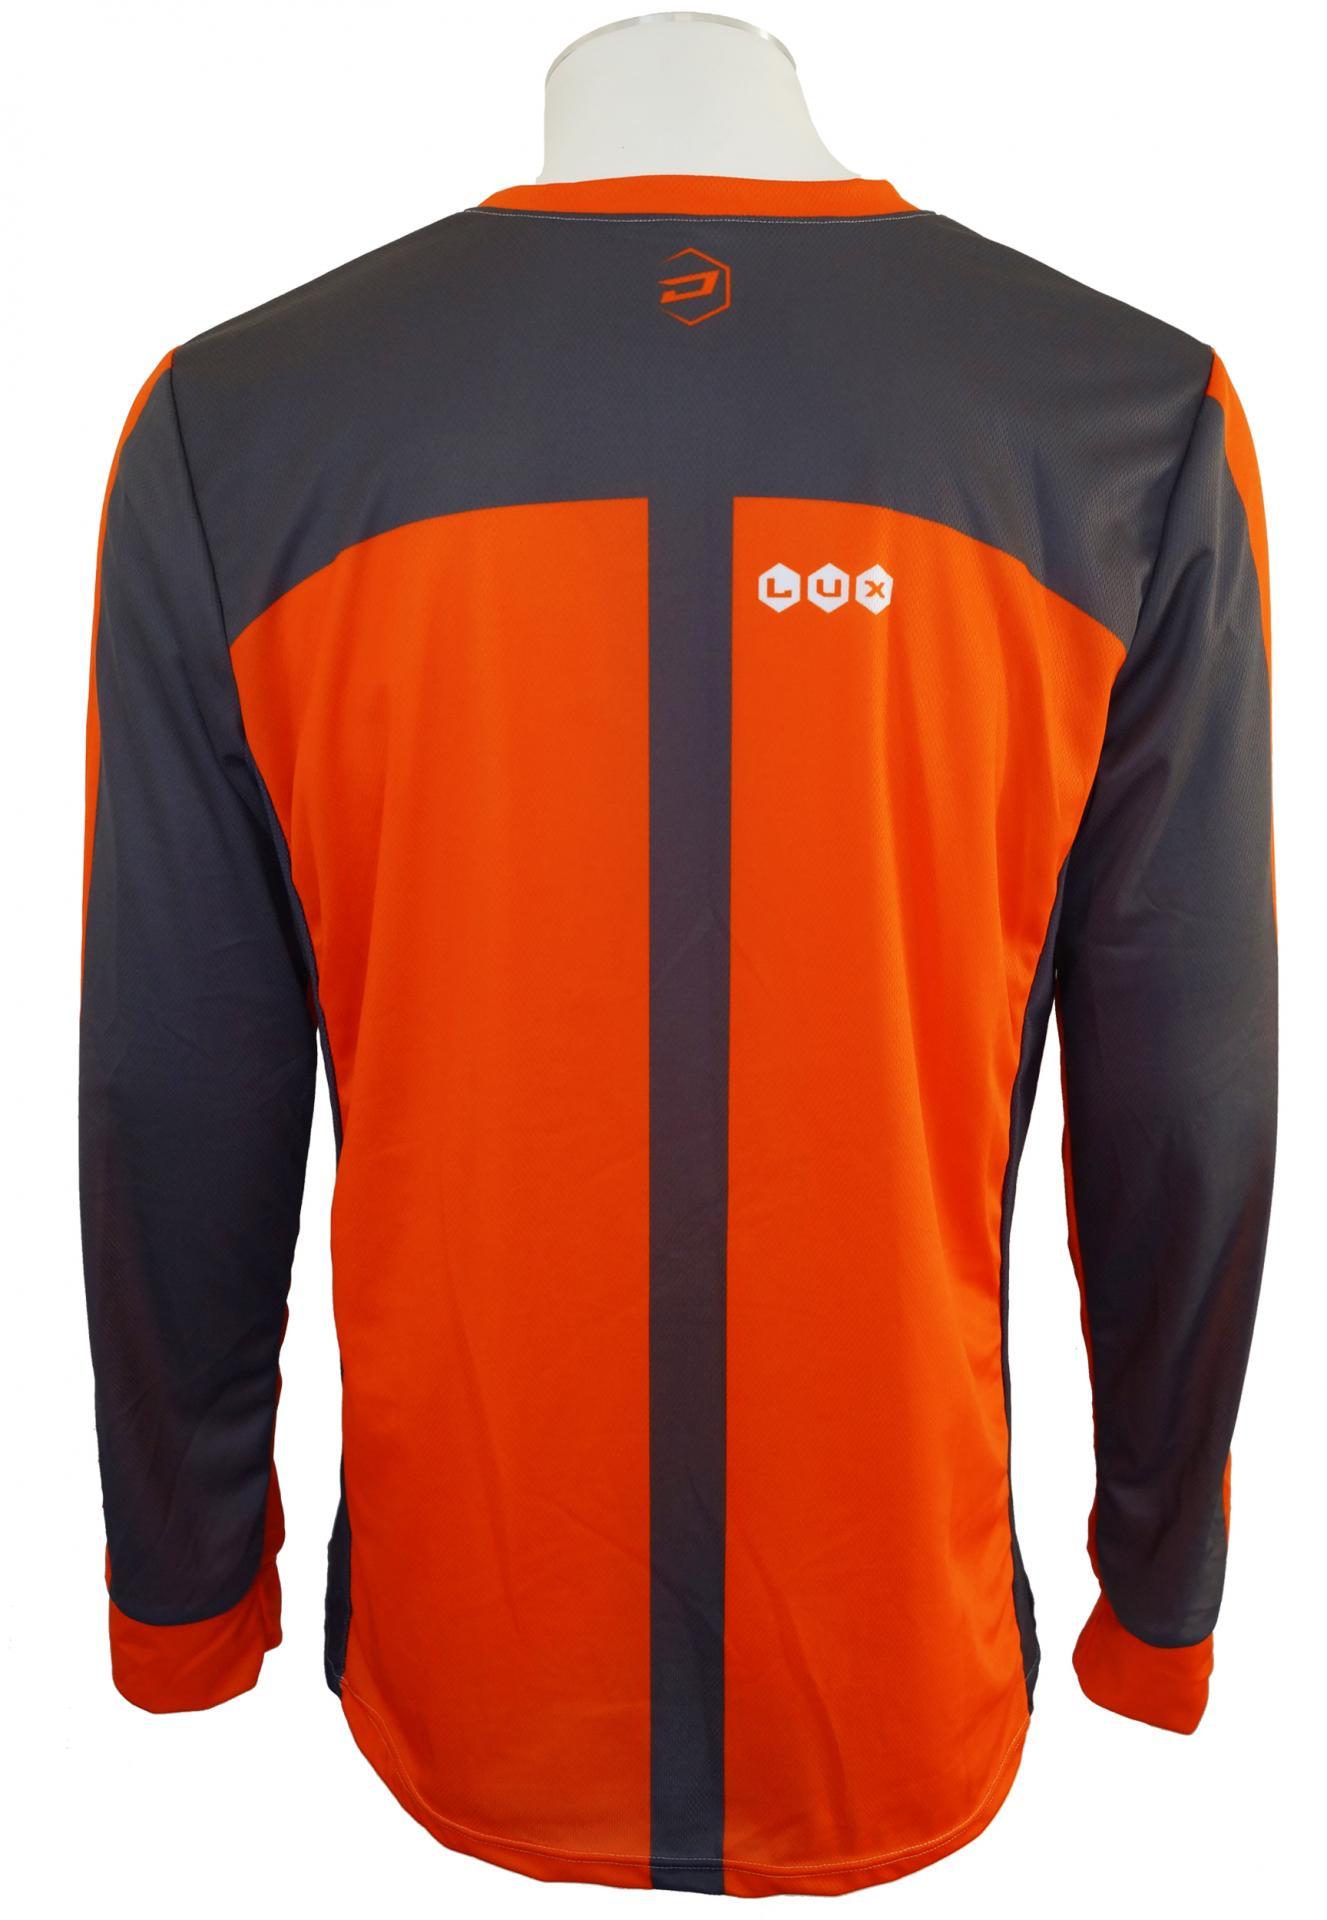 Maillot orange dos